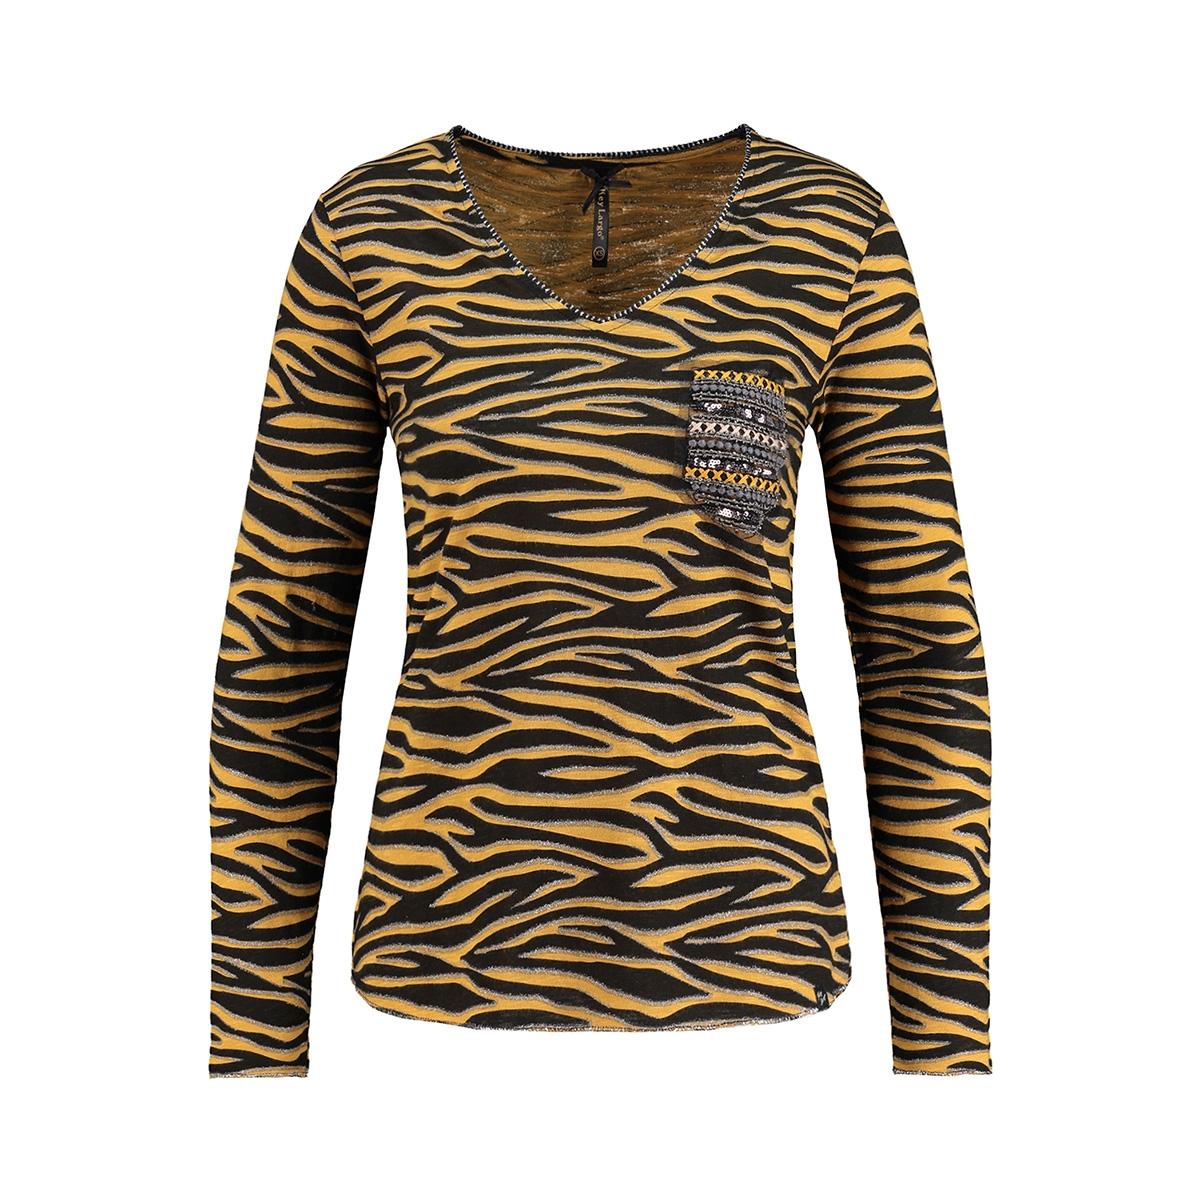 expedition v neck wls00217 key largo t-shirt 1414 dark yellow